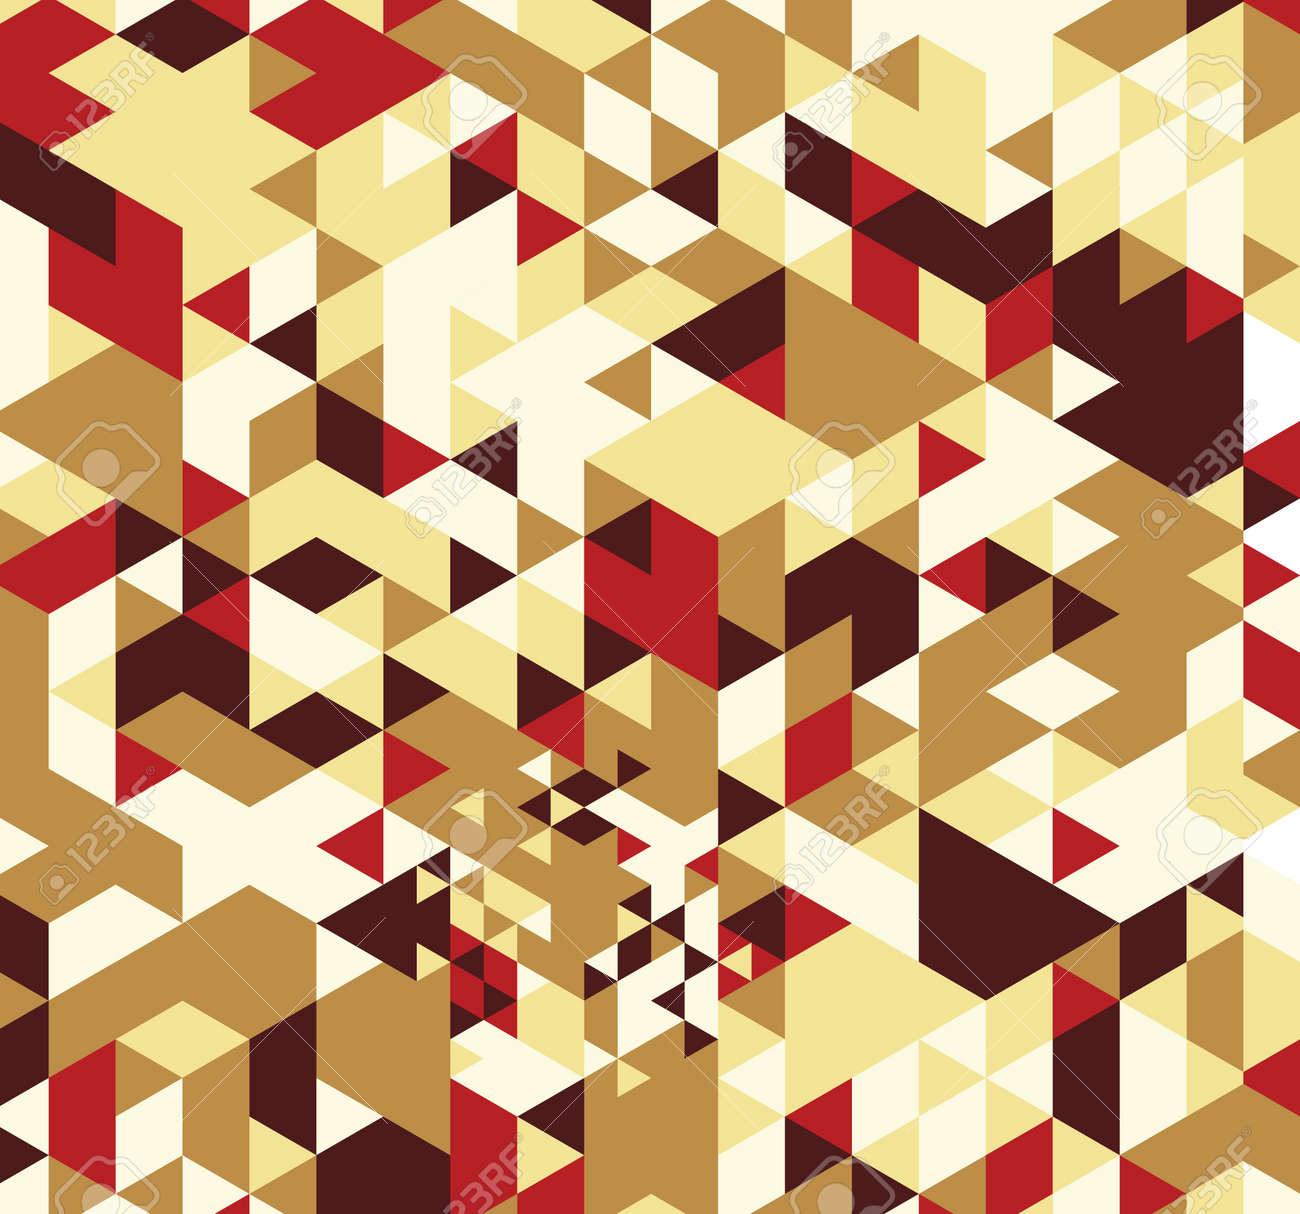 Geometric hipster retro background. Retro triangle vector background Stock Photo - 21151390